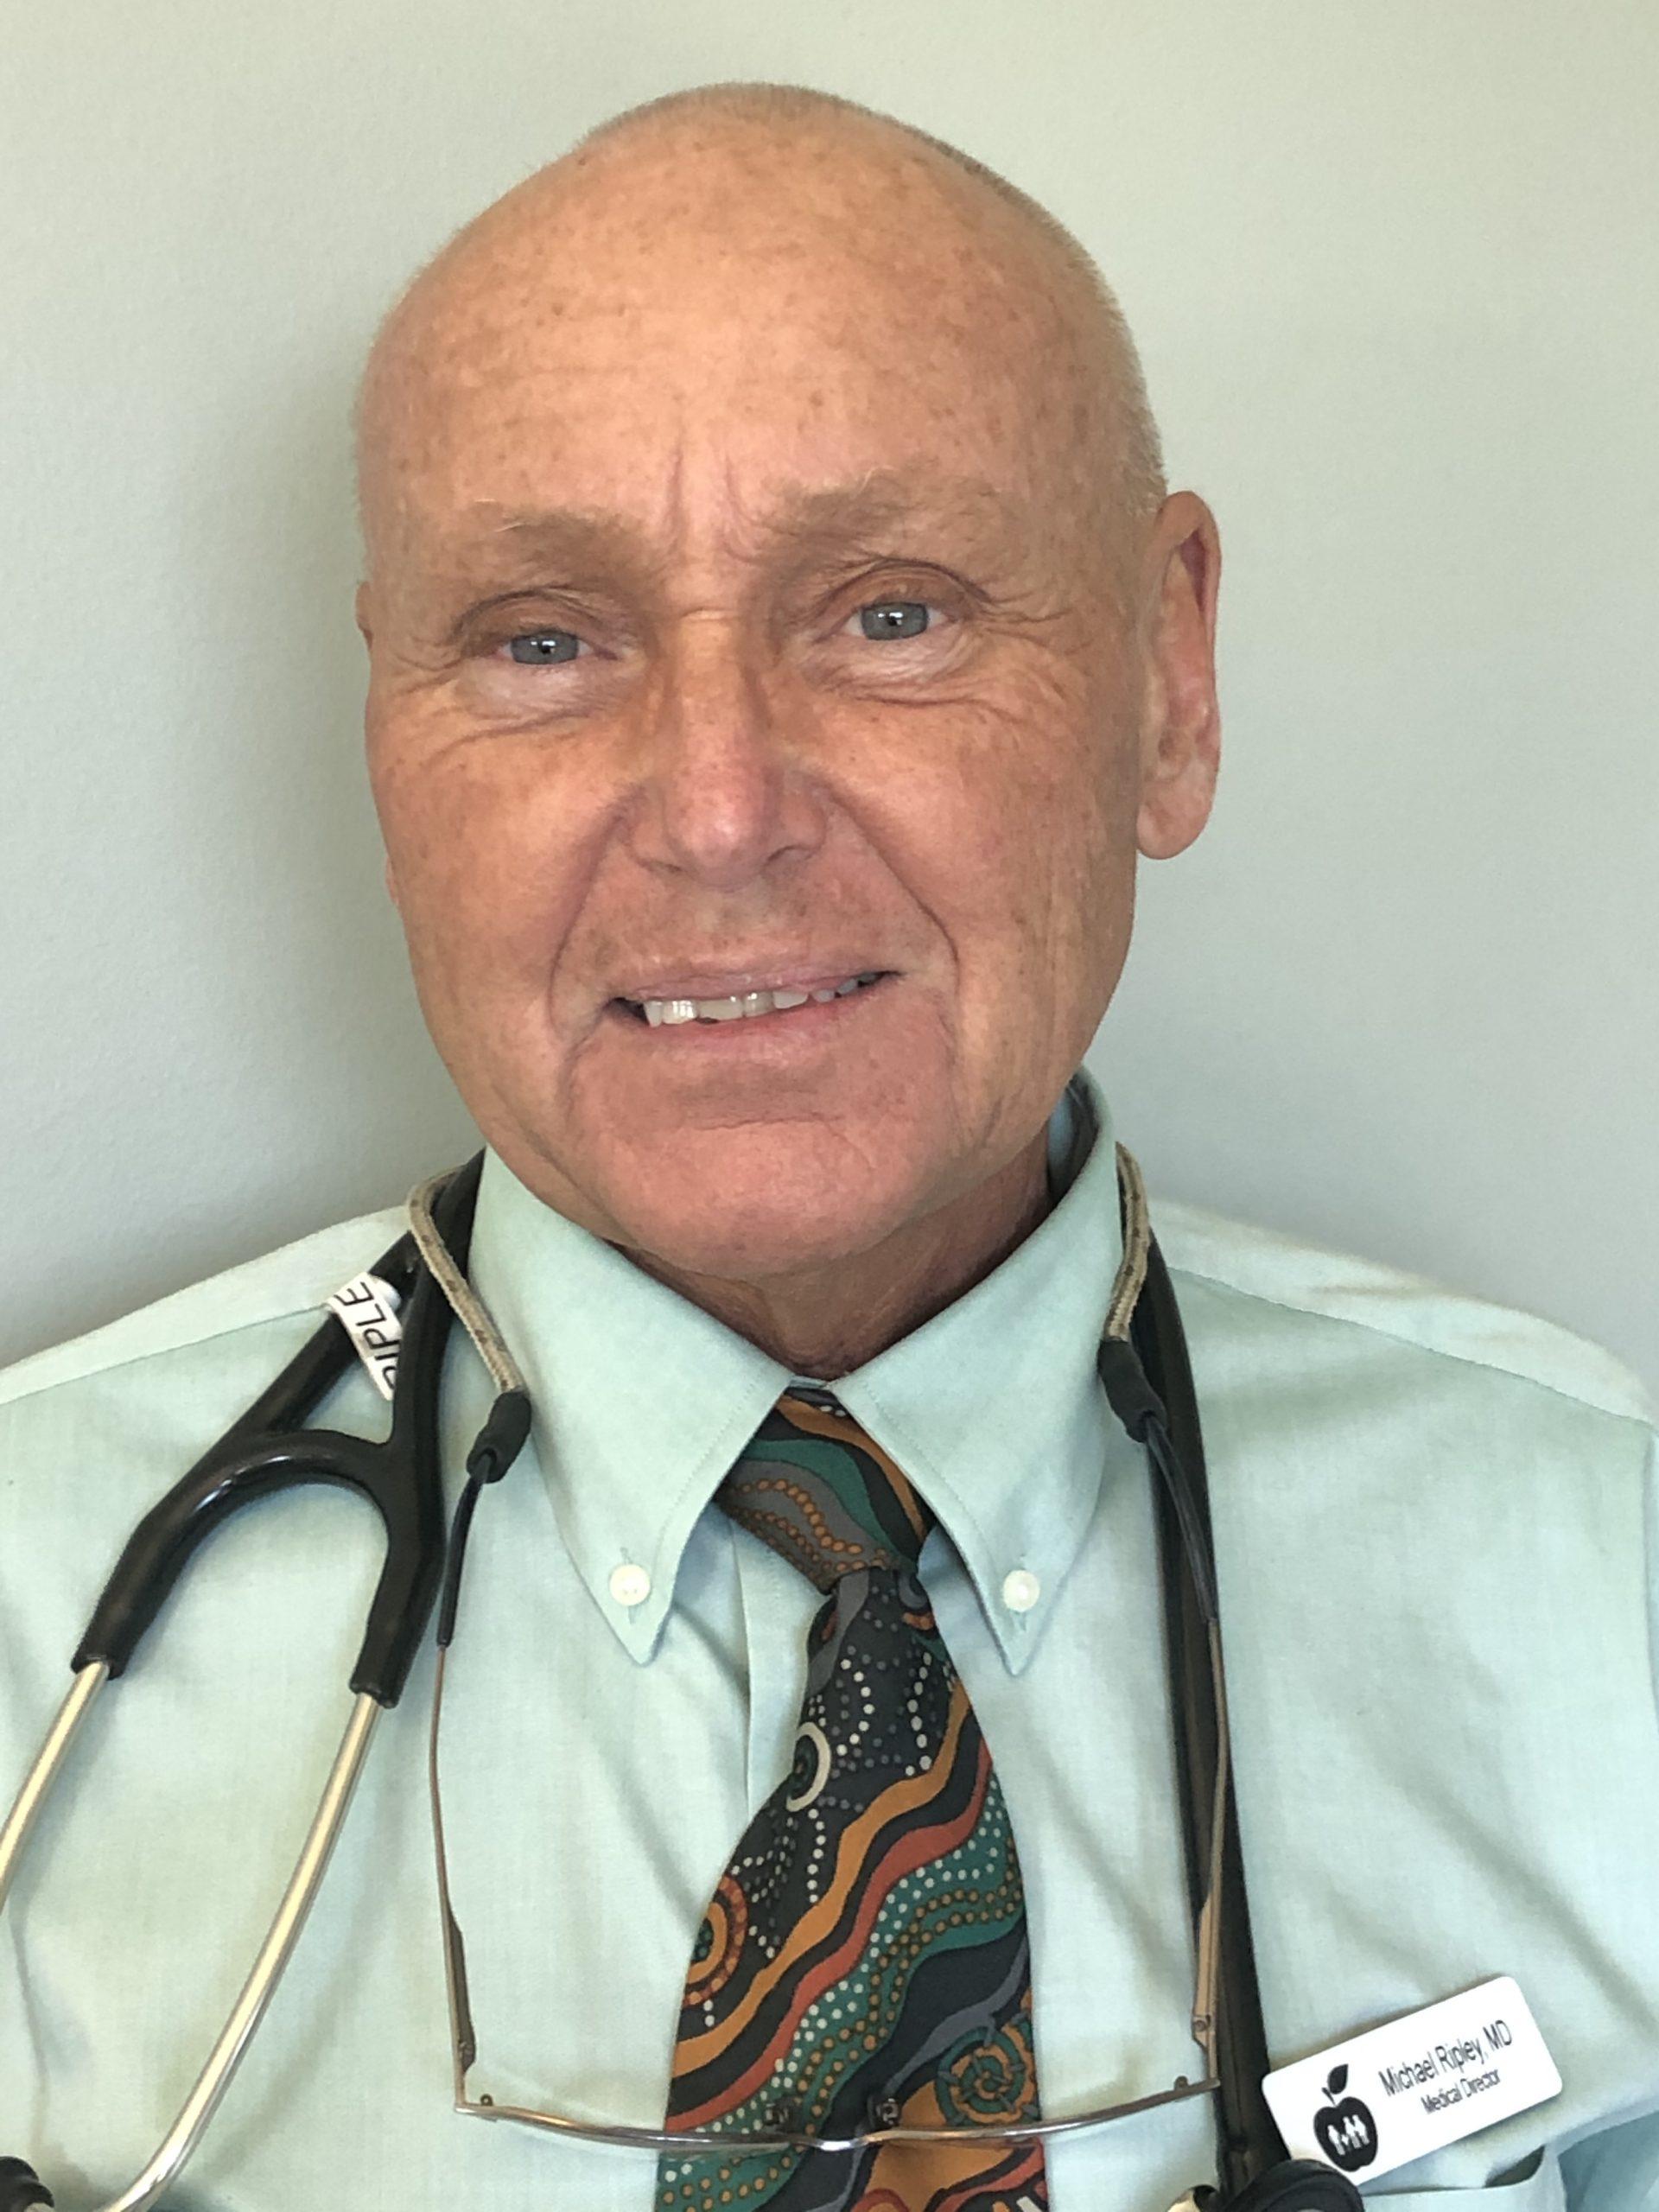 Dr. Michael Ripley, MD, Medical Director